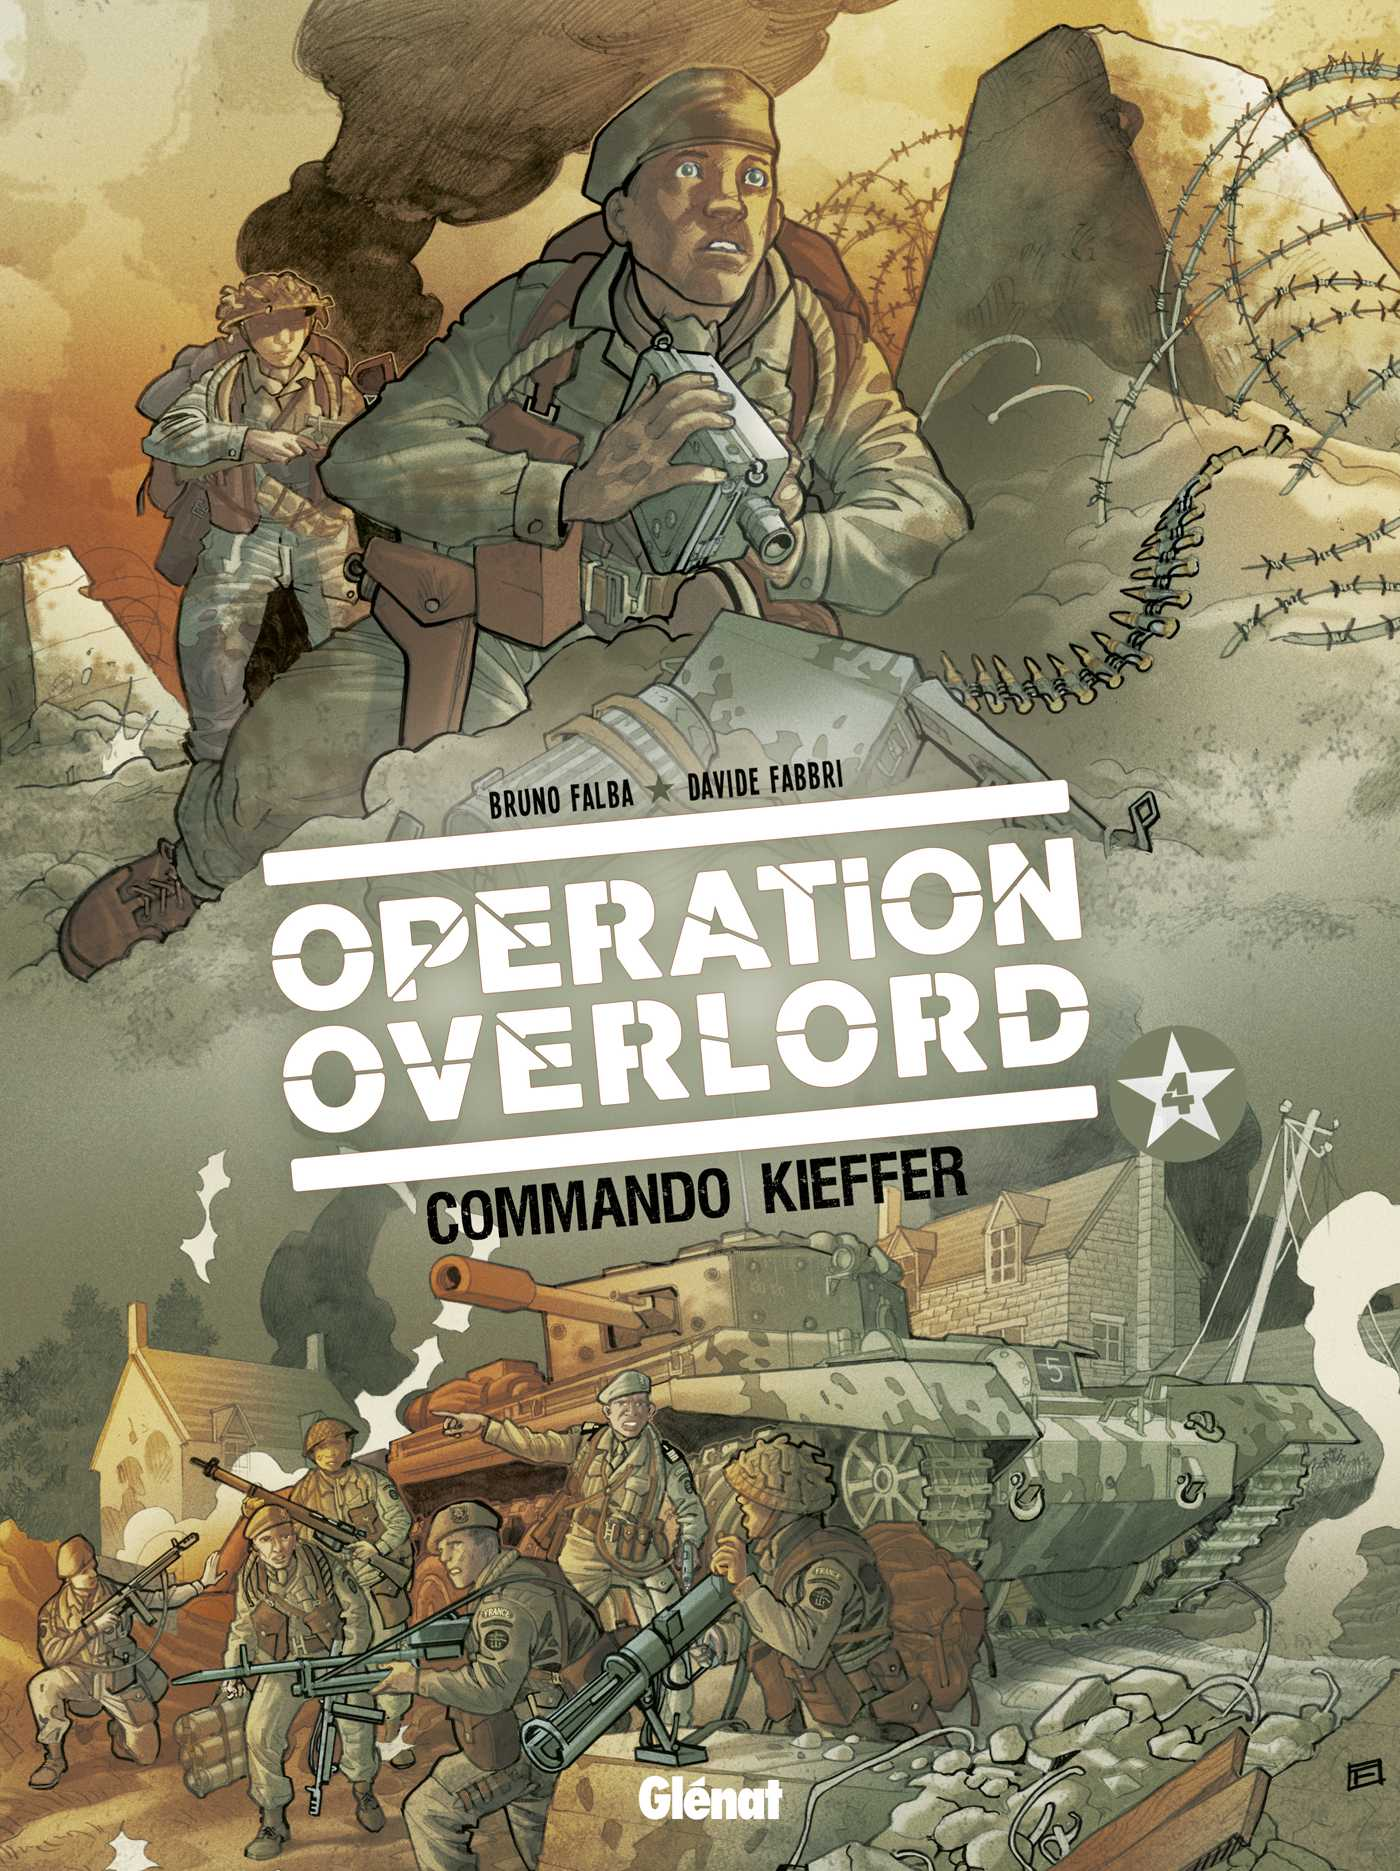 Opération Overlord T4, le commando Kieffer le 6 juin 44